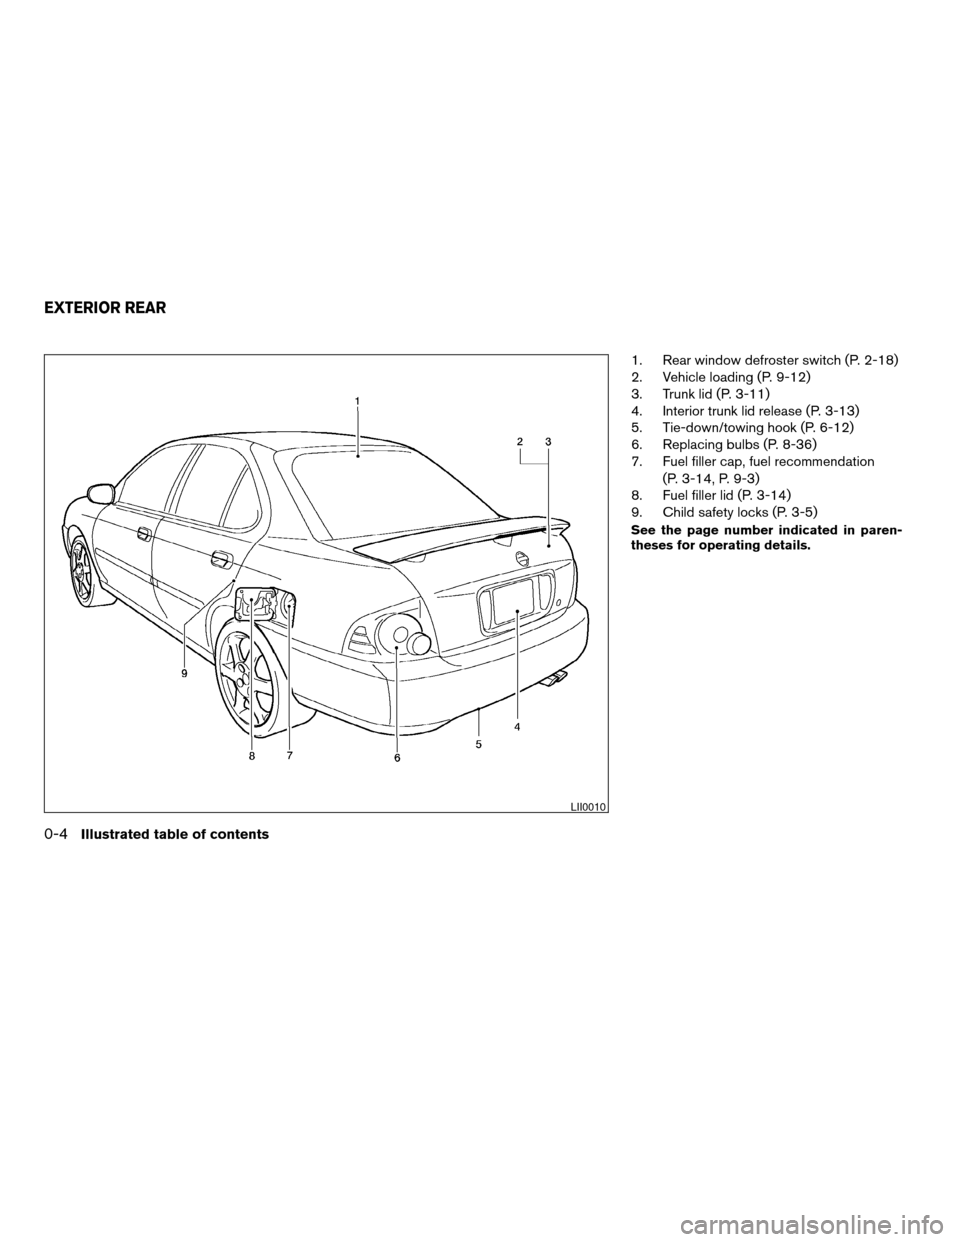 NISSAN SENTRA 2004 B15 / 5.G Owners Manual